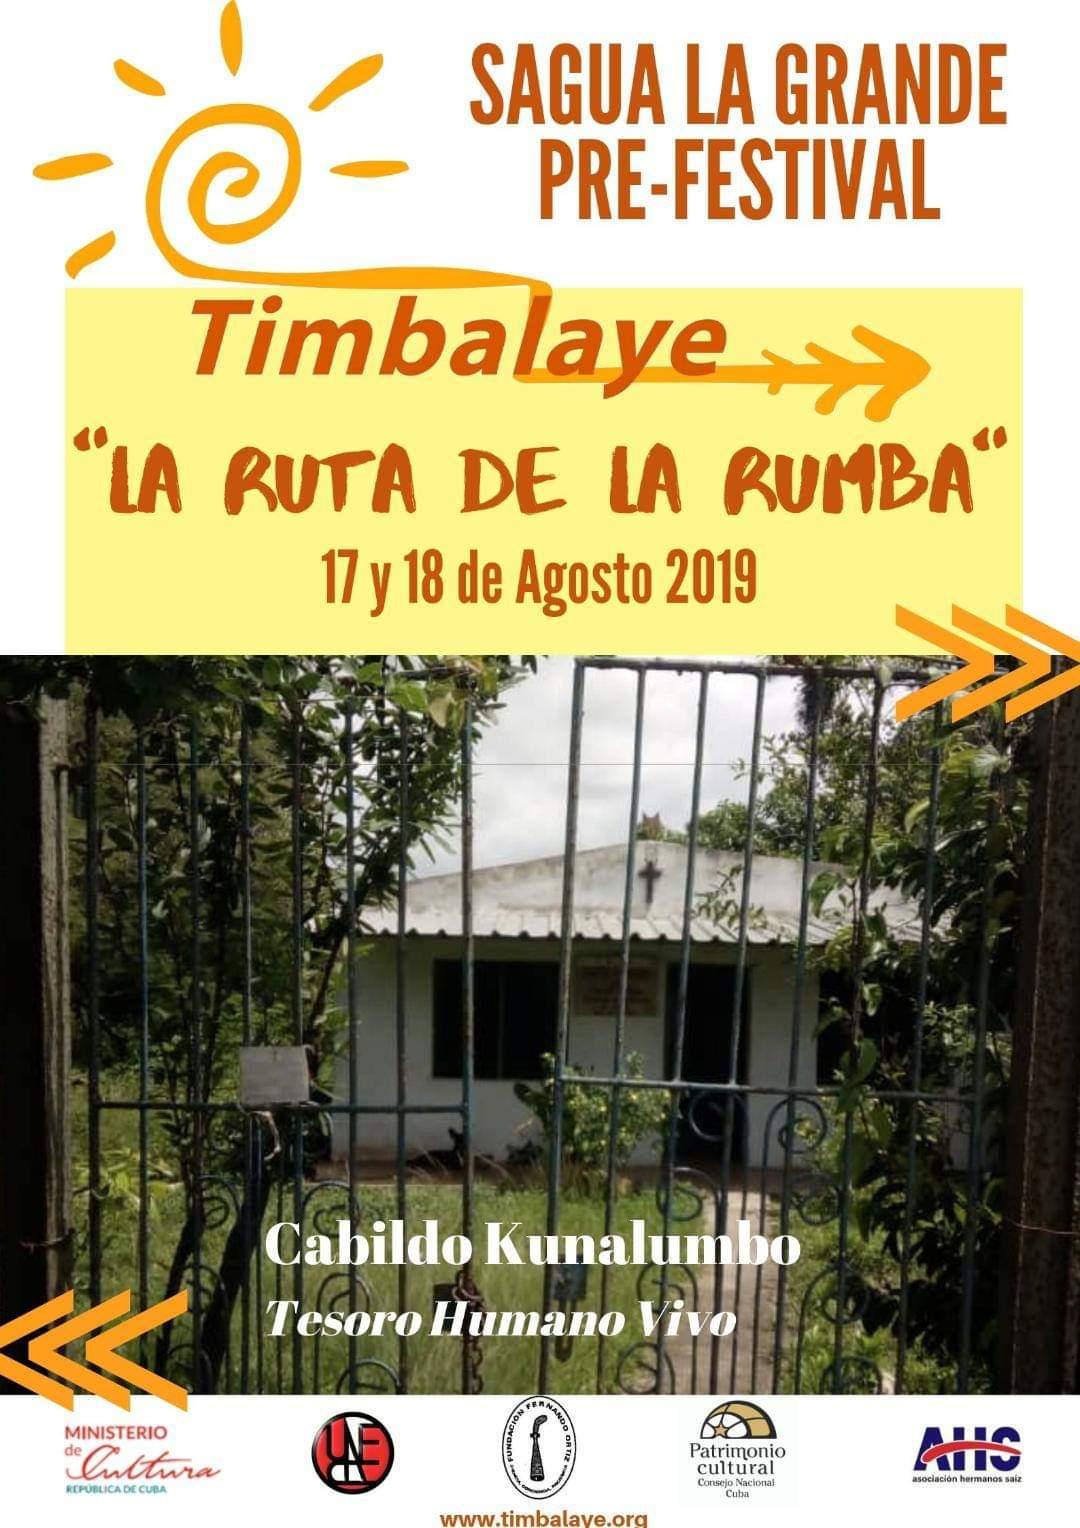 Prefestival Timbalaye La Ruta de la Rumba en Sagua la Grande